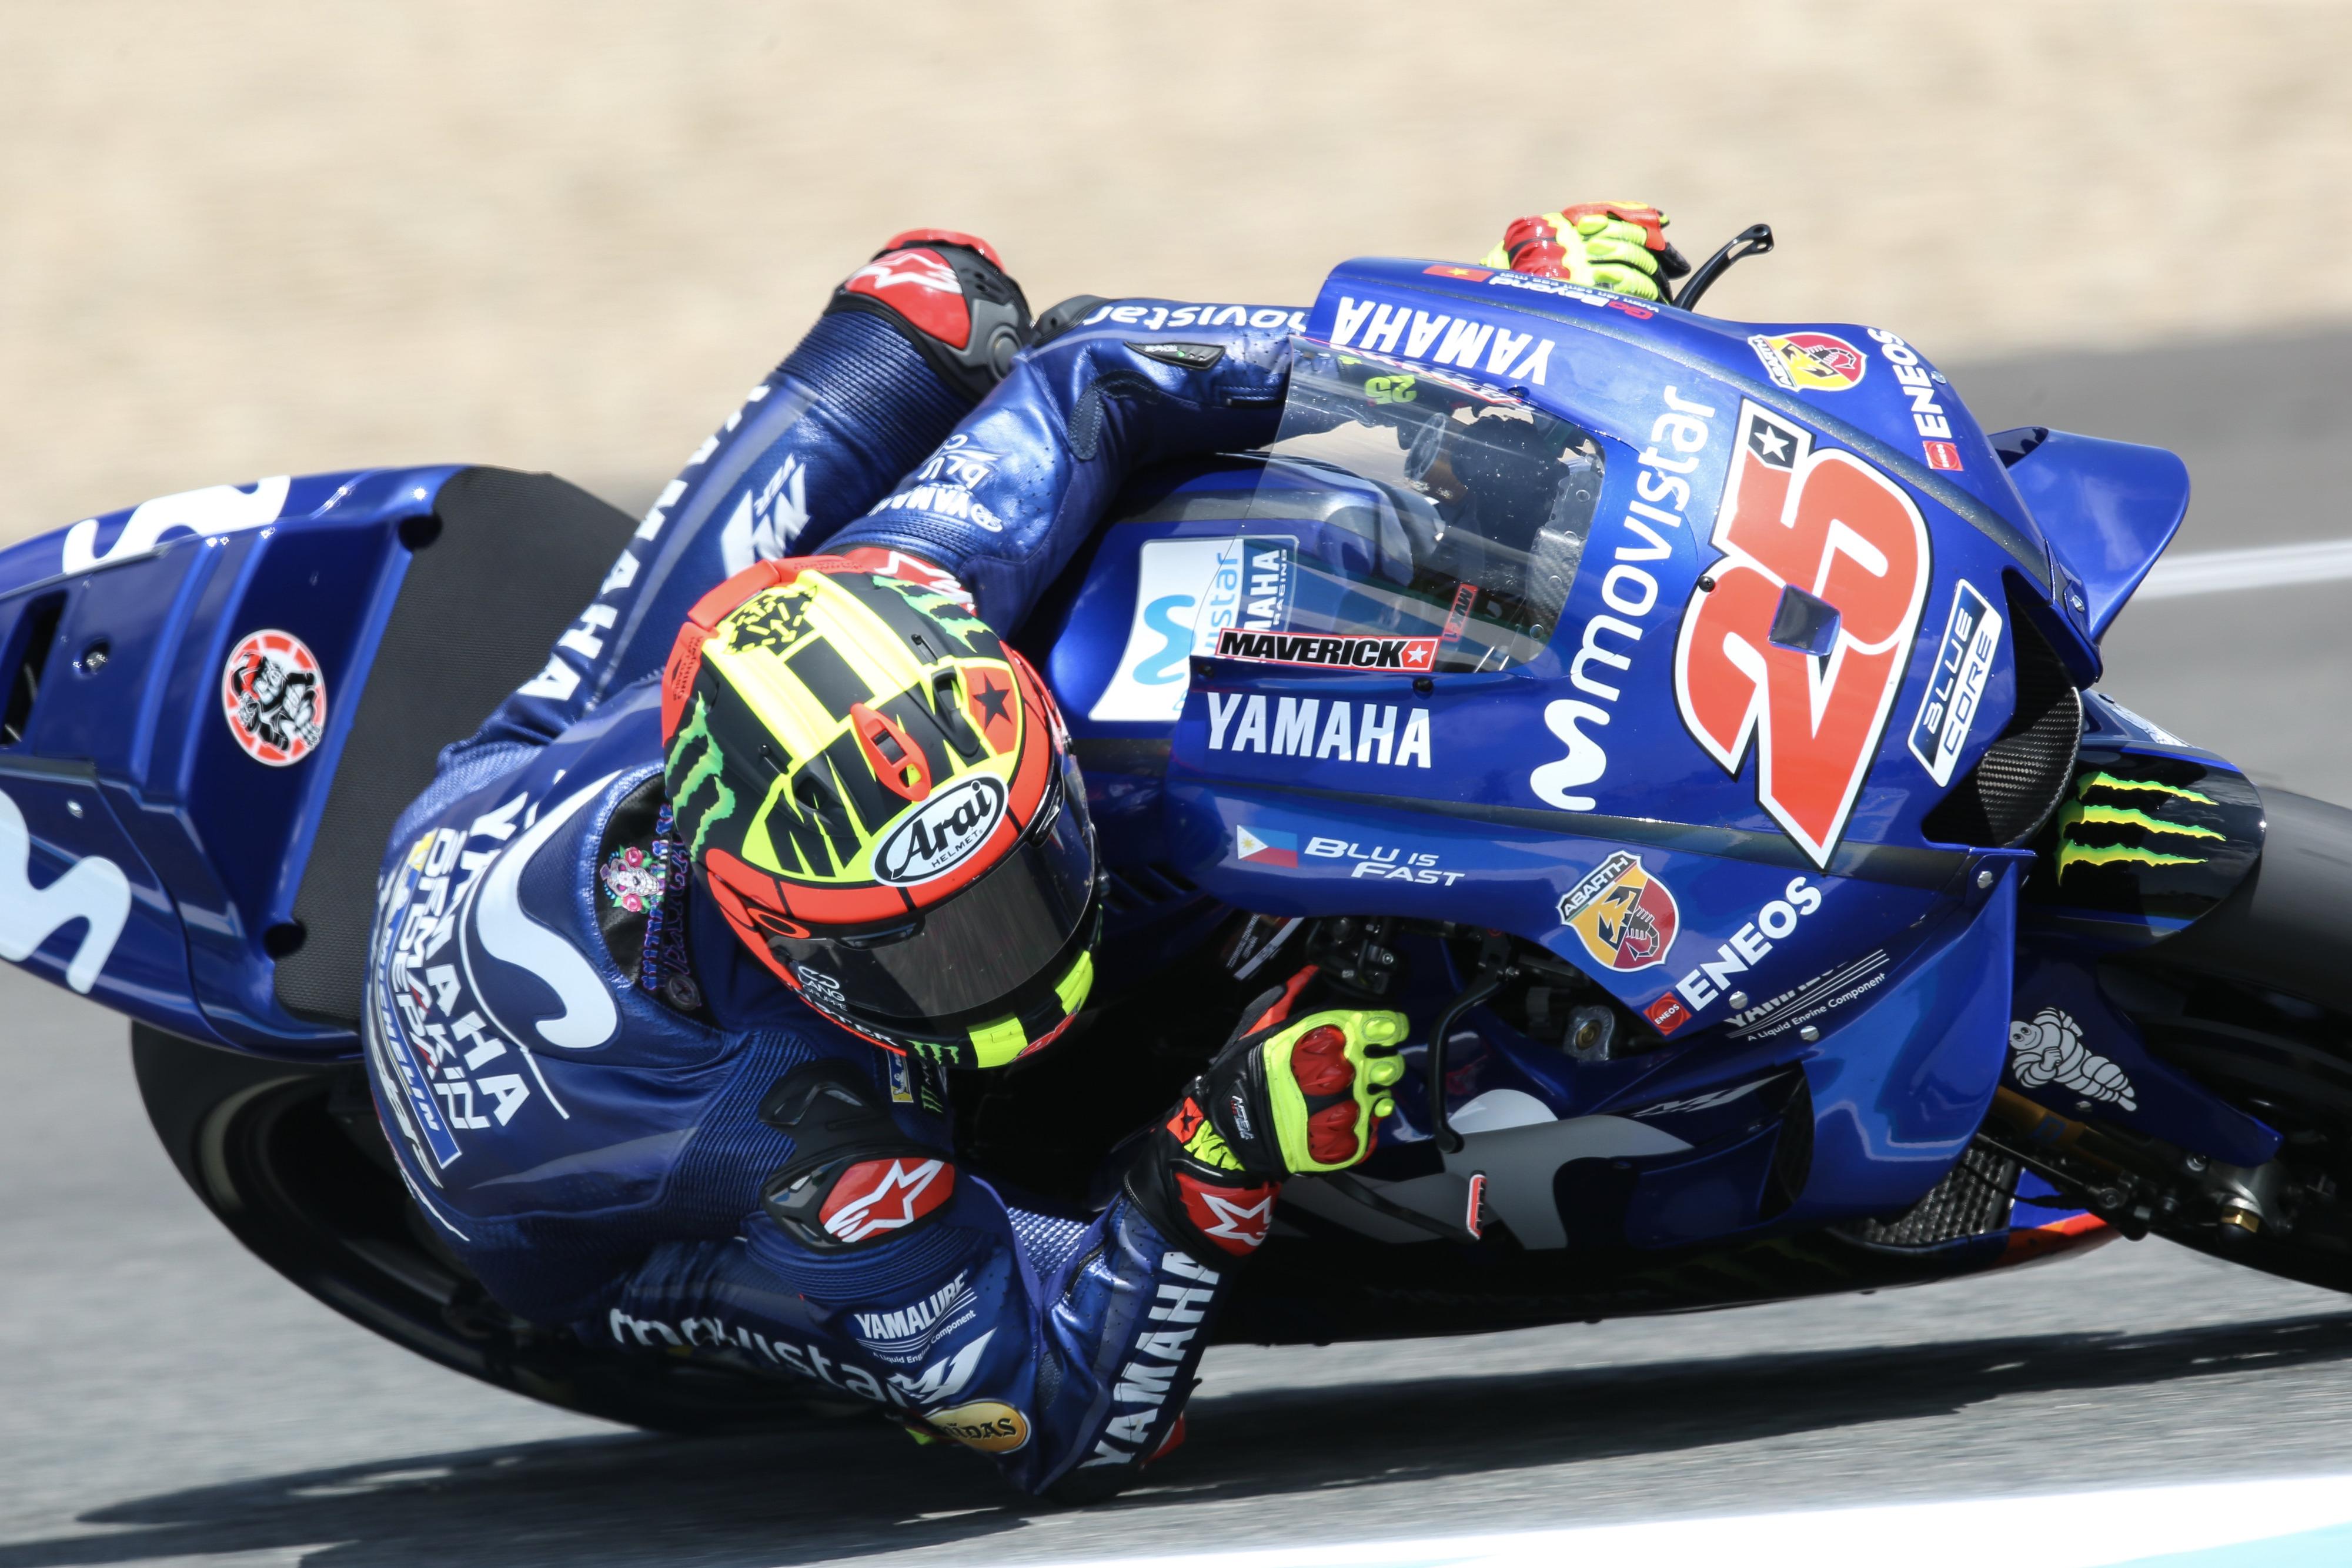 Movistar Yamaha MotoGP Prepare for French Grand Prix Fight - Yamaha Racing